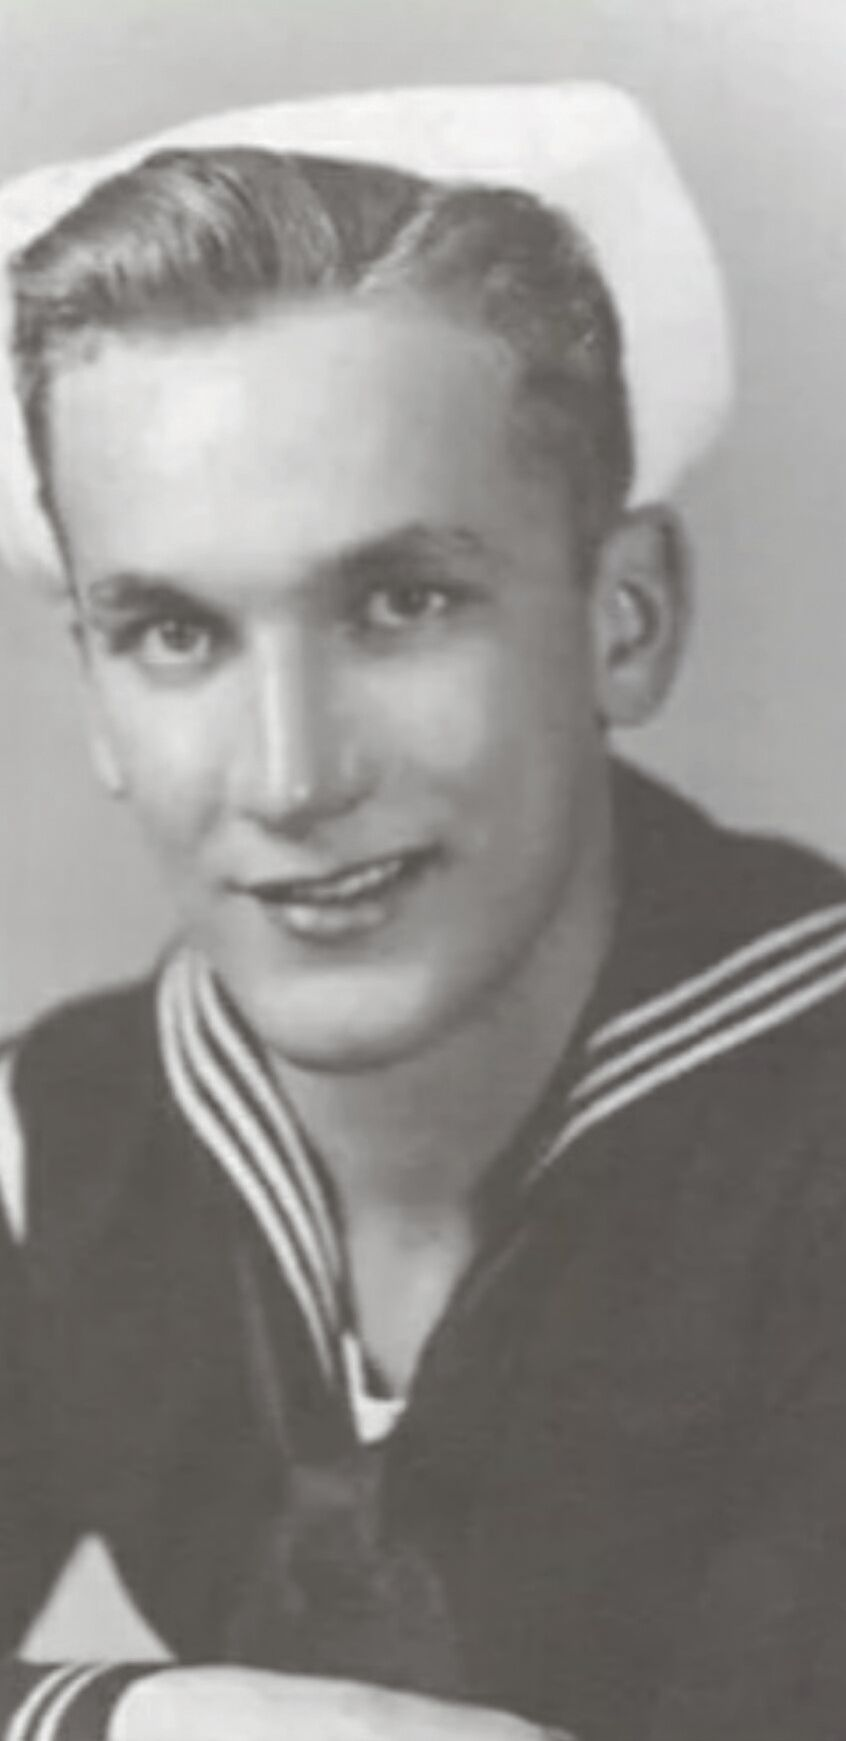 Roy Lundstrom Jr. 2